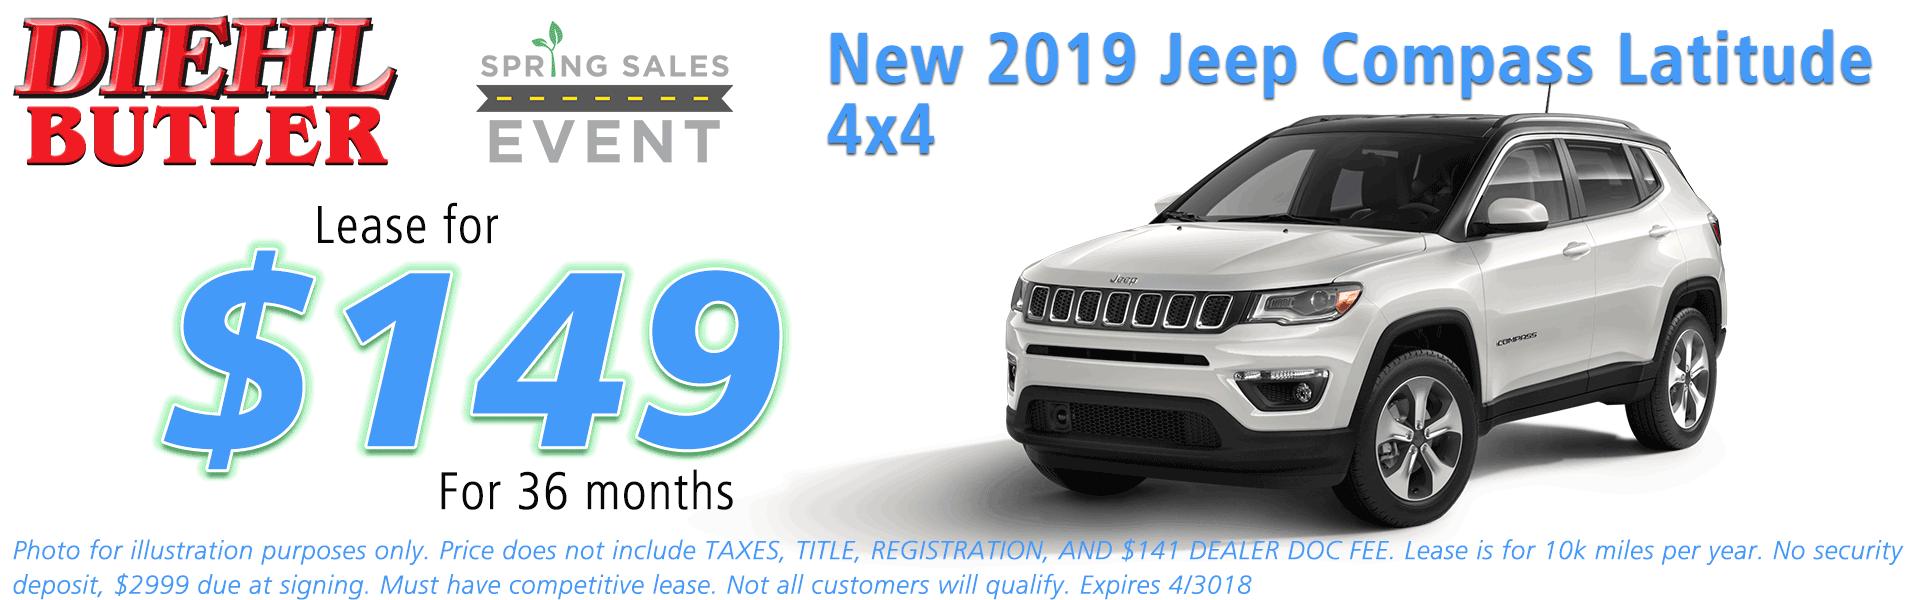 NEW 2018 JEEP COMPASS LATITUDE 4X4 Diehl of Butler Chrysler Jeep Dodge Ram Toyota Volkswagen 258 Pittsburgh Road Butler PA 16002